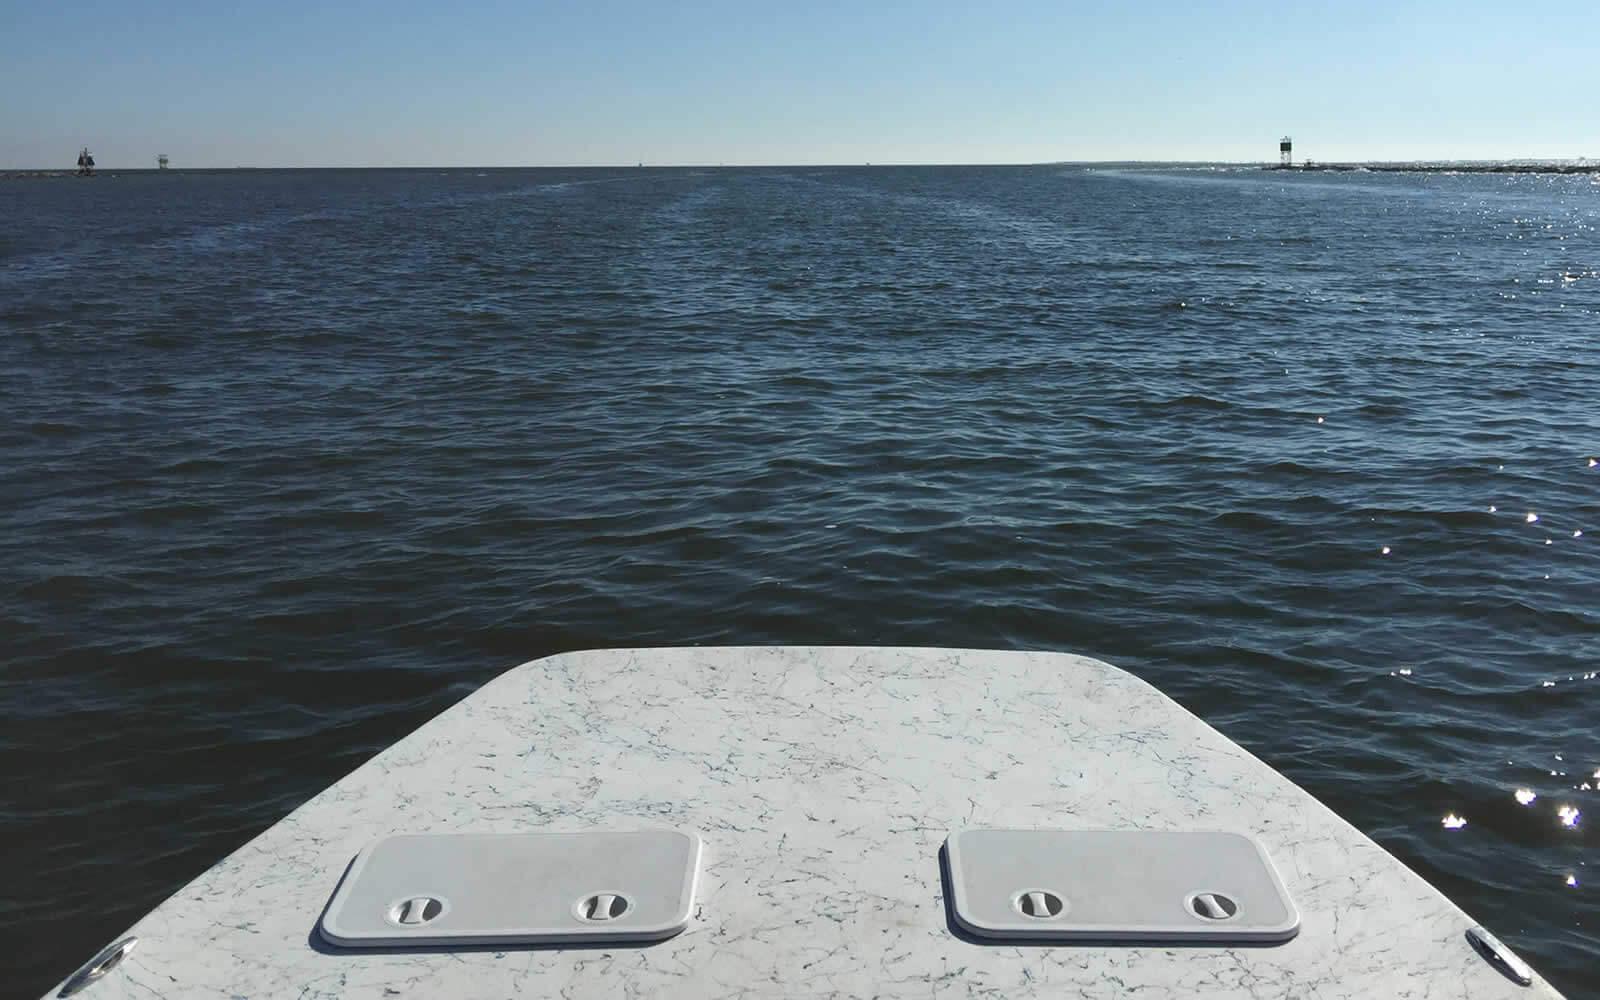 Shoalwater Boats 21 Foot Catamaran Shallow Fishing Boat